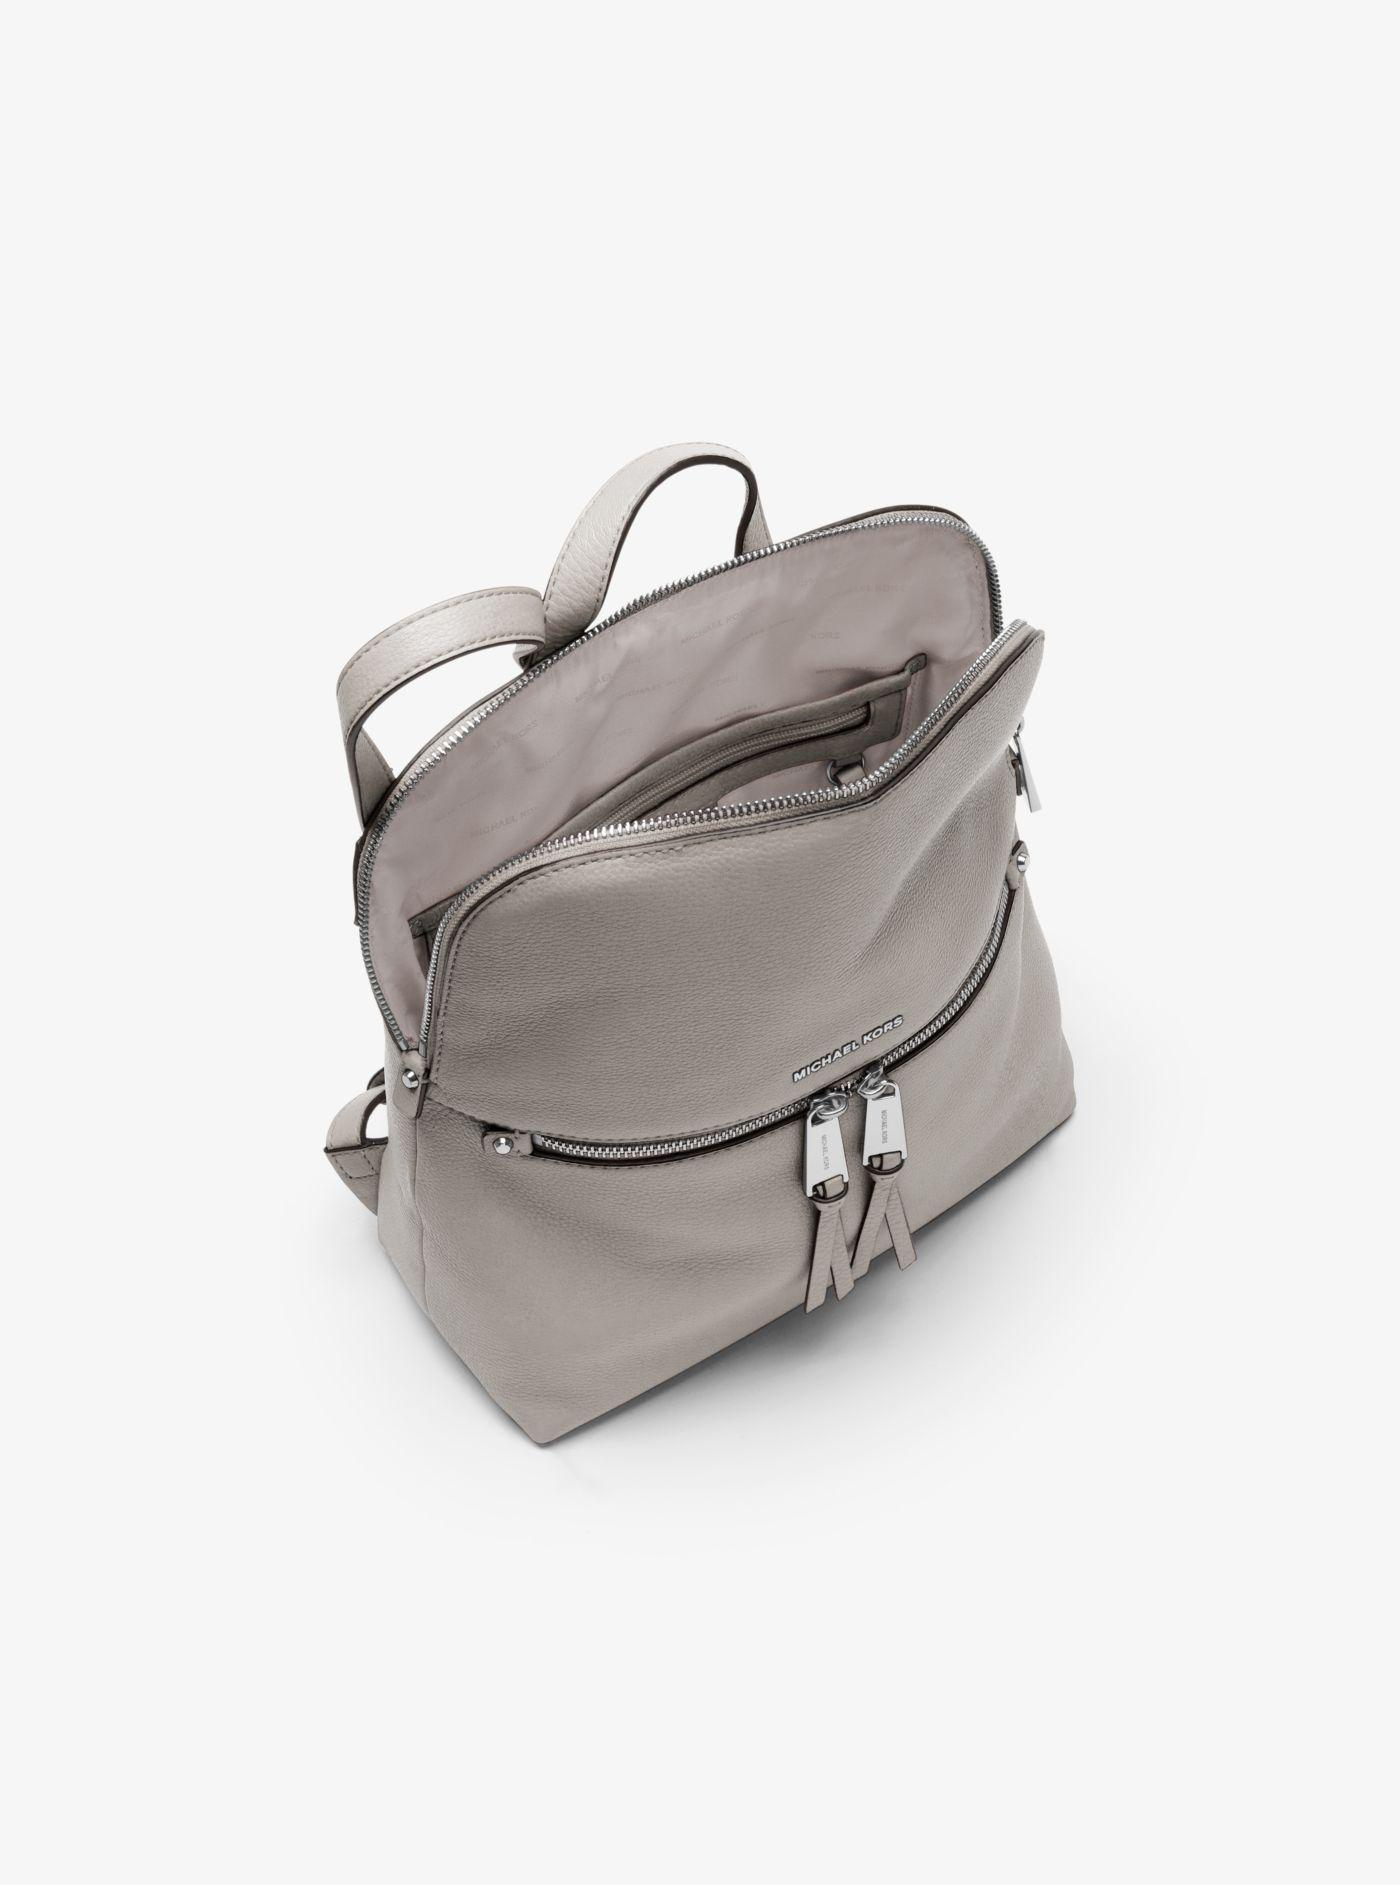 32b56fb04c73 Michael Kors Rhea Medium Slim Leather Backpack in Gray - Lyst